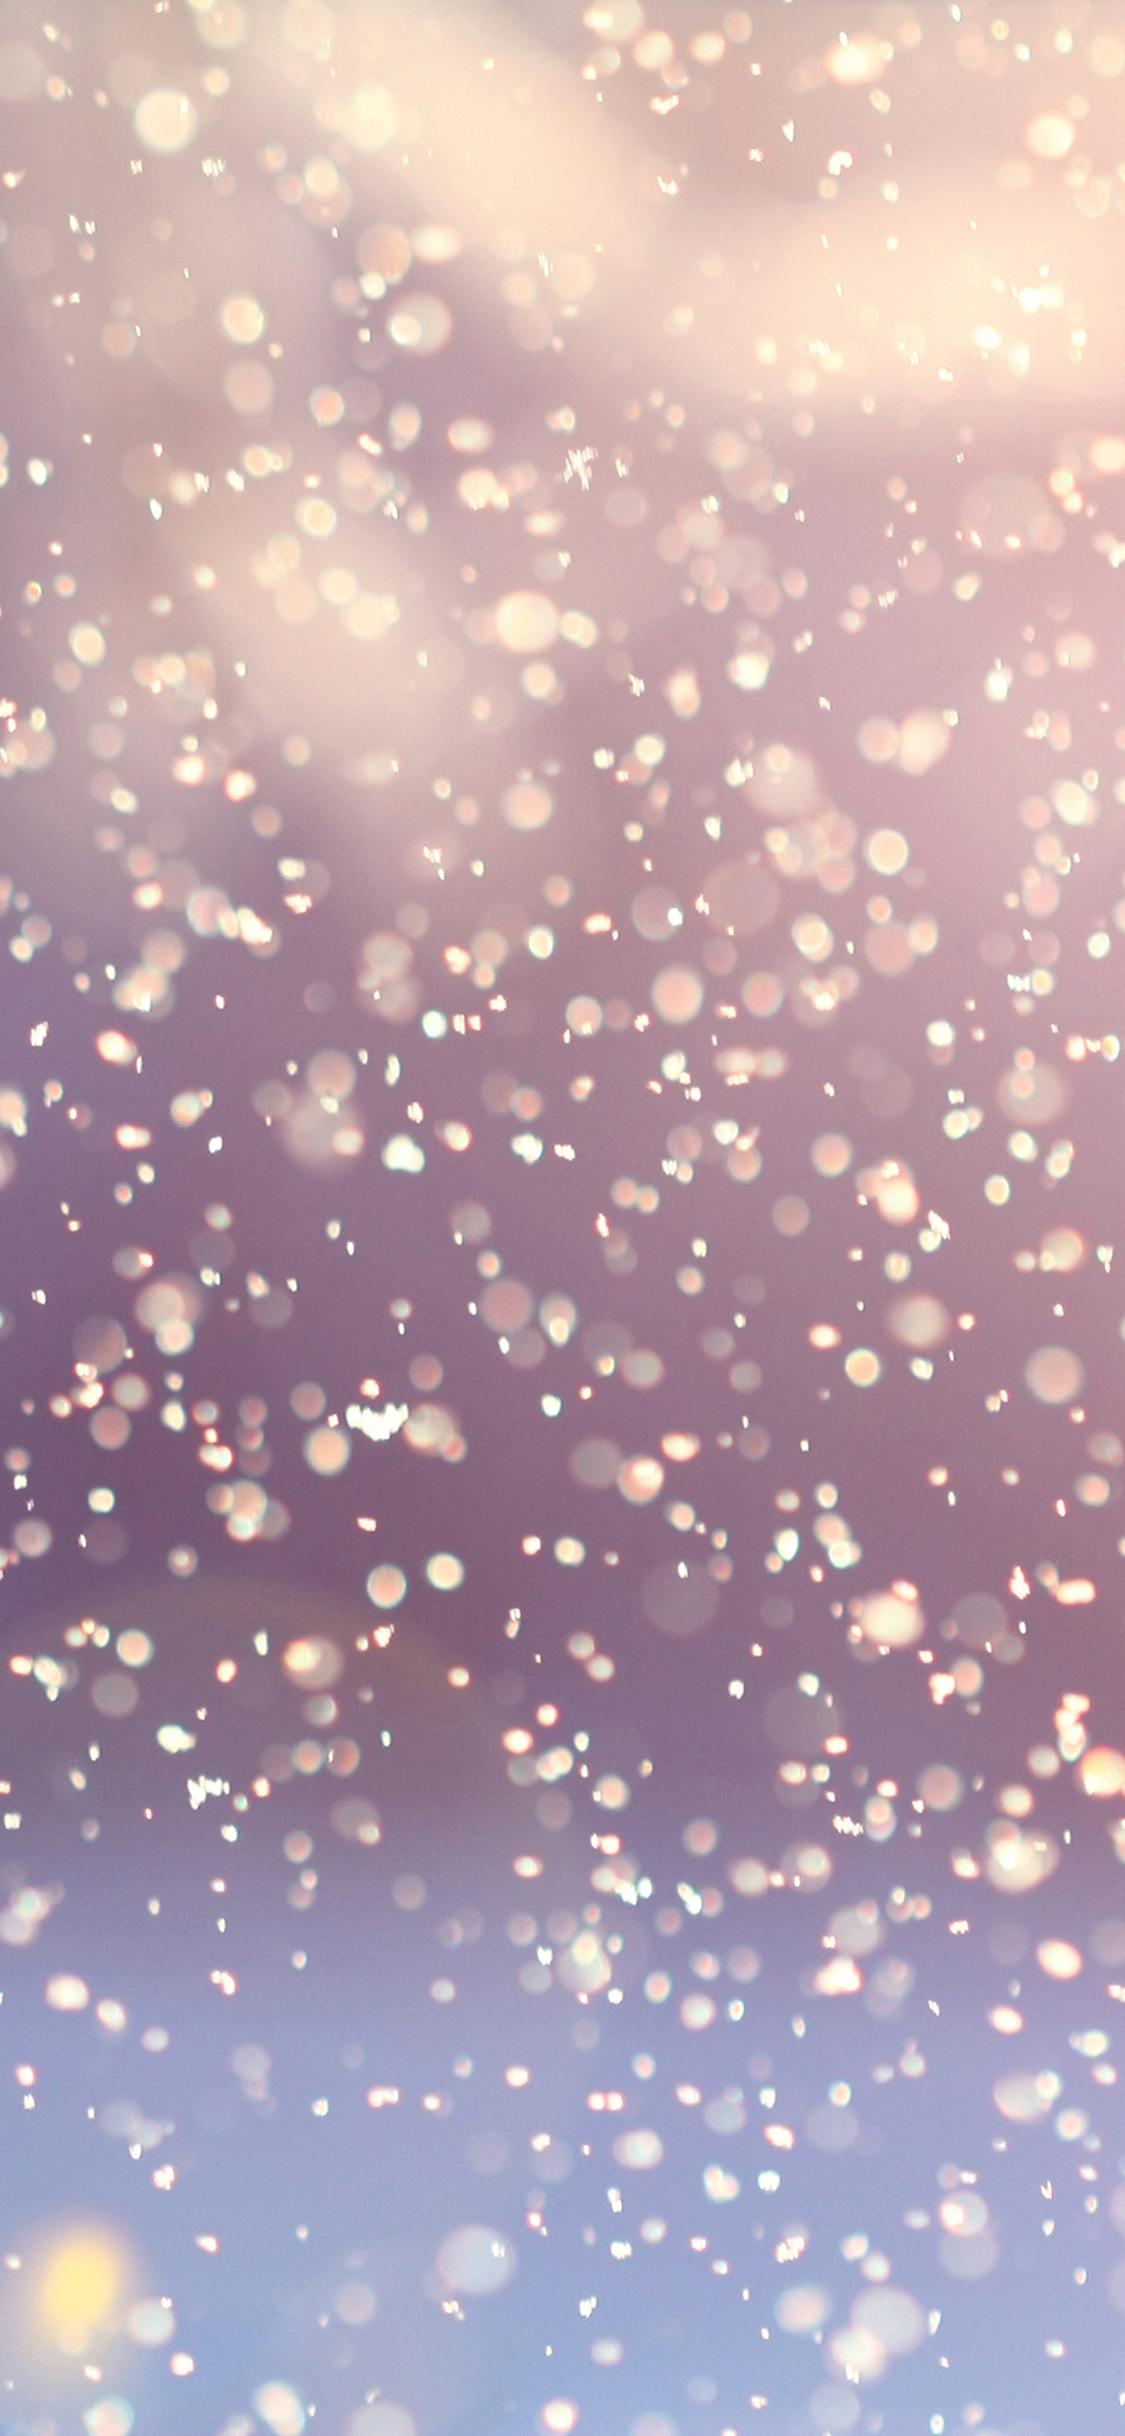 iPhoneXpapers.com-Apple-iPhone-wallpaper-vi63-bokeh-snow-flare-water-splash-pattern